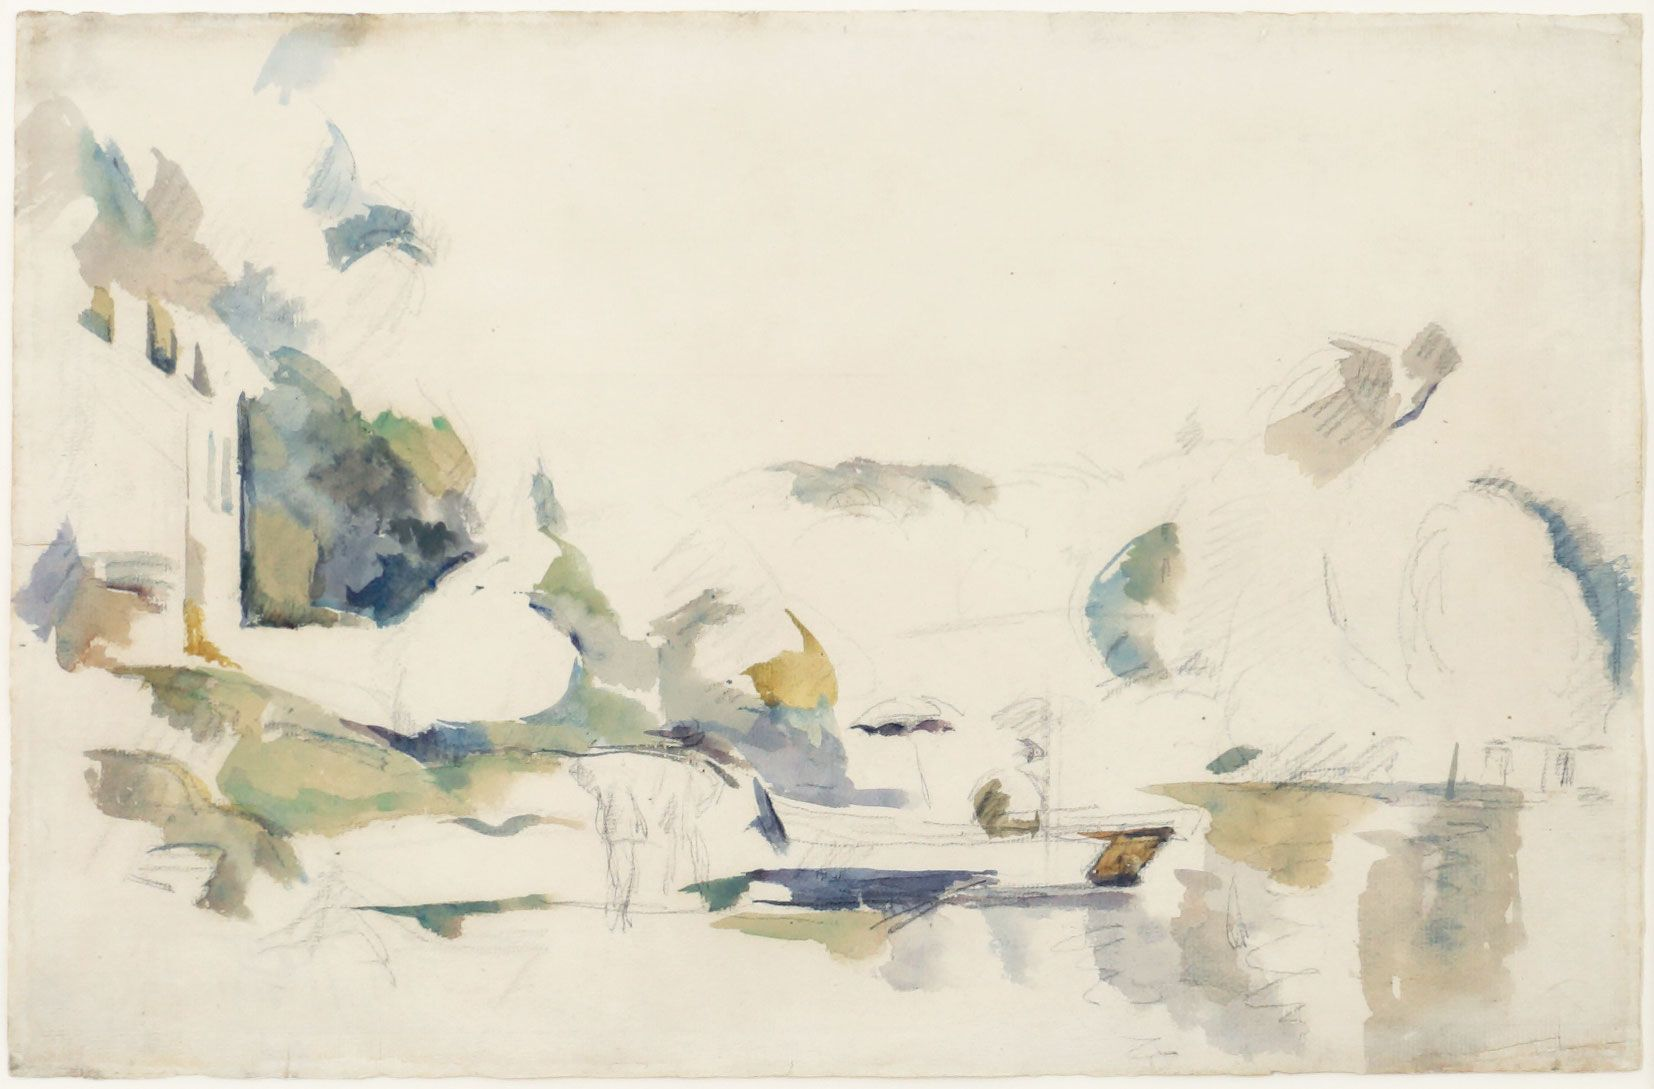 Paul Cezanne, La Barque, Le Lac D'Annecy, 1896, Watercolor and pencil on paper 12 1/4 x 18 5/8 inches